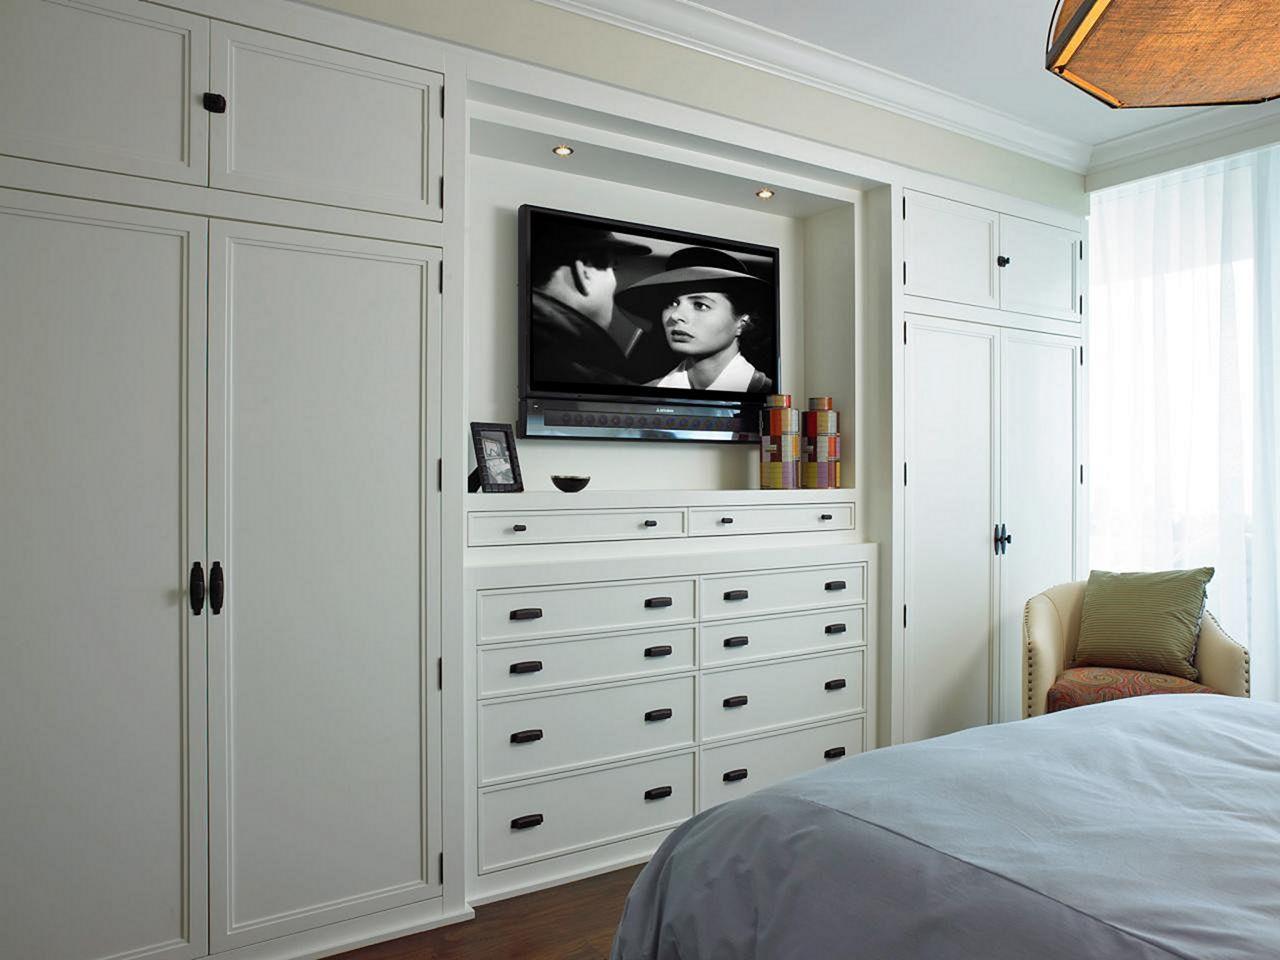 Bedroom Wall Storage Ideas 12 Bedroom Wall Storage Ideas 12